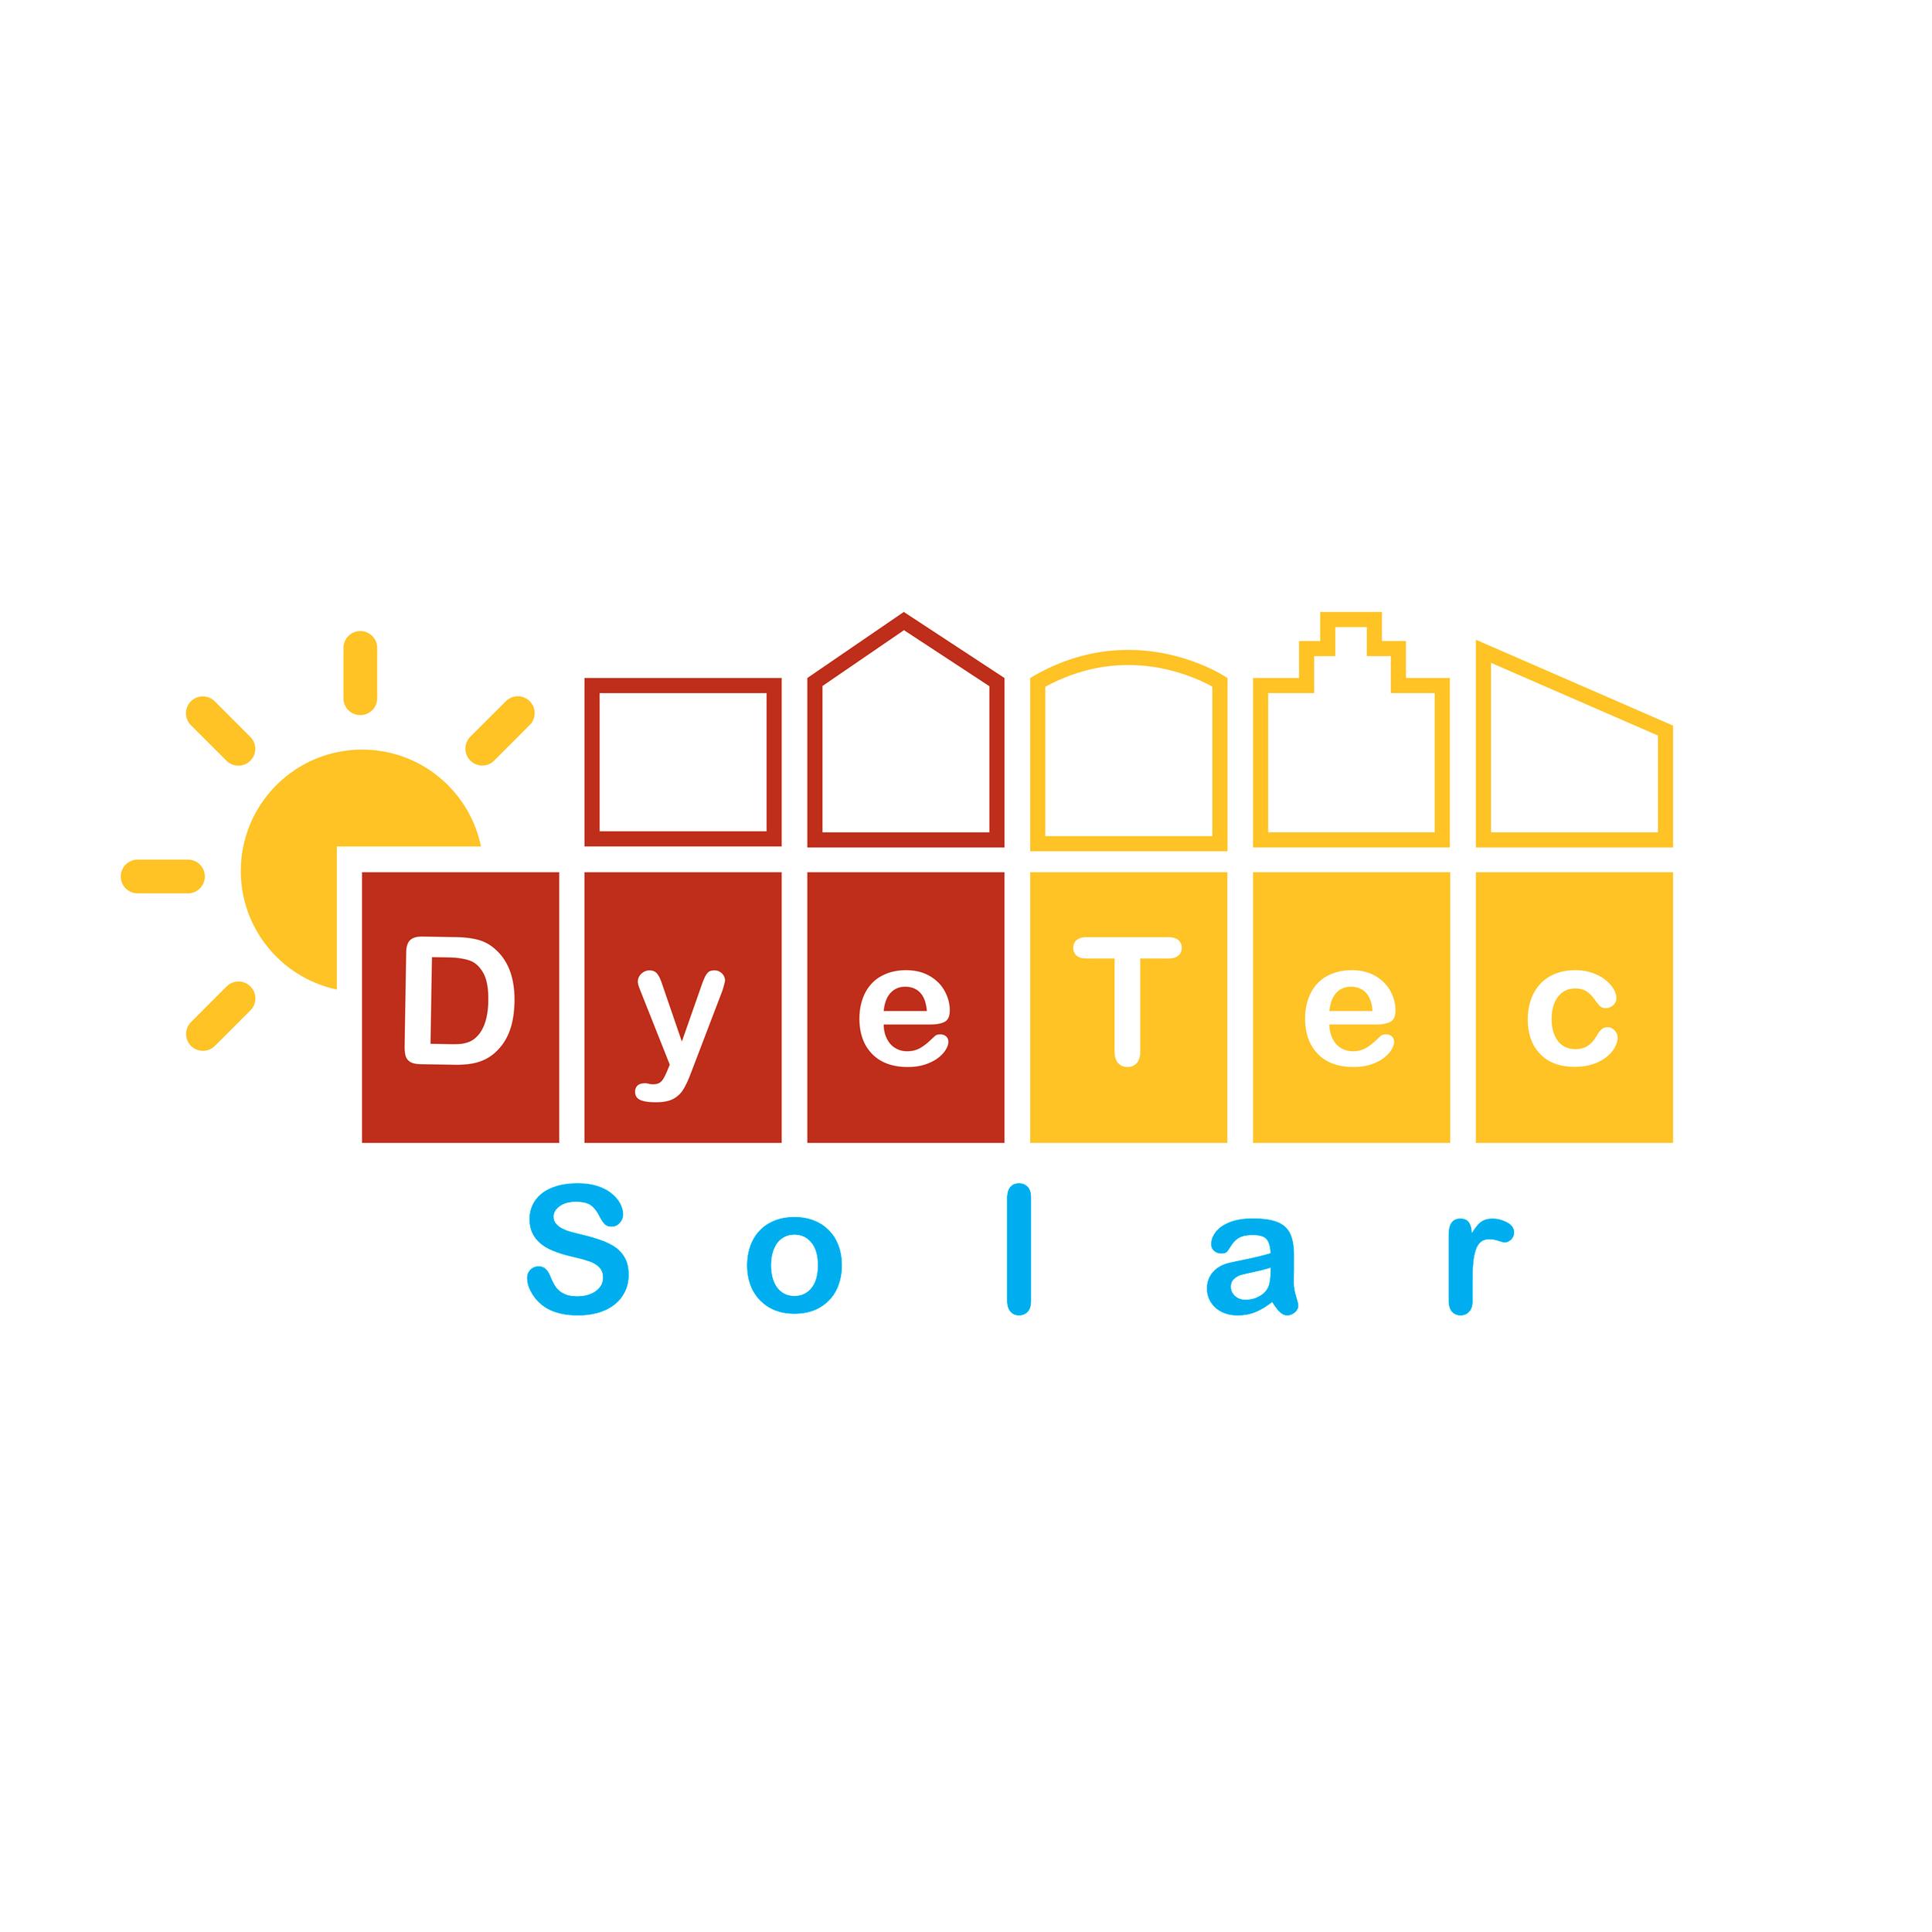 Dyetec-solar-logo.jpg